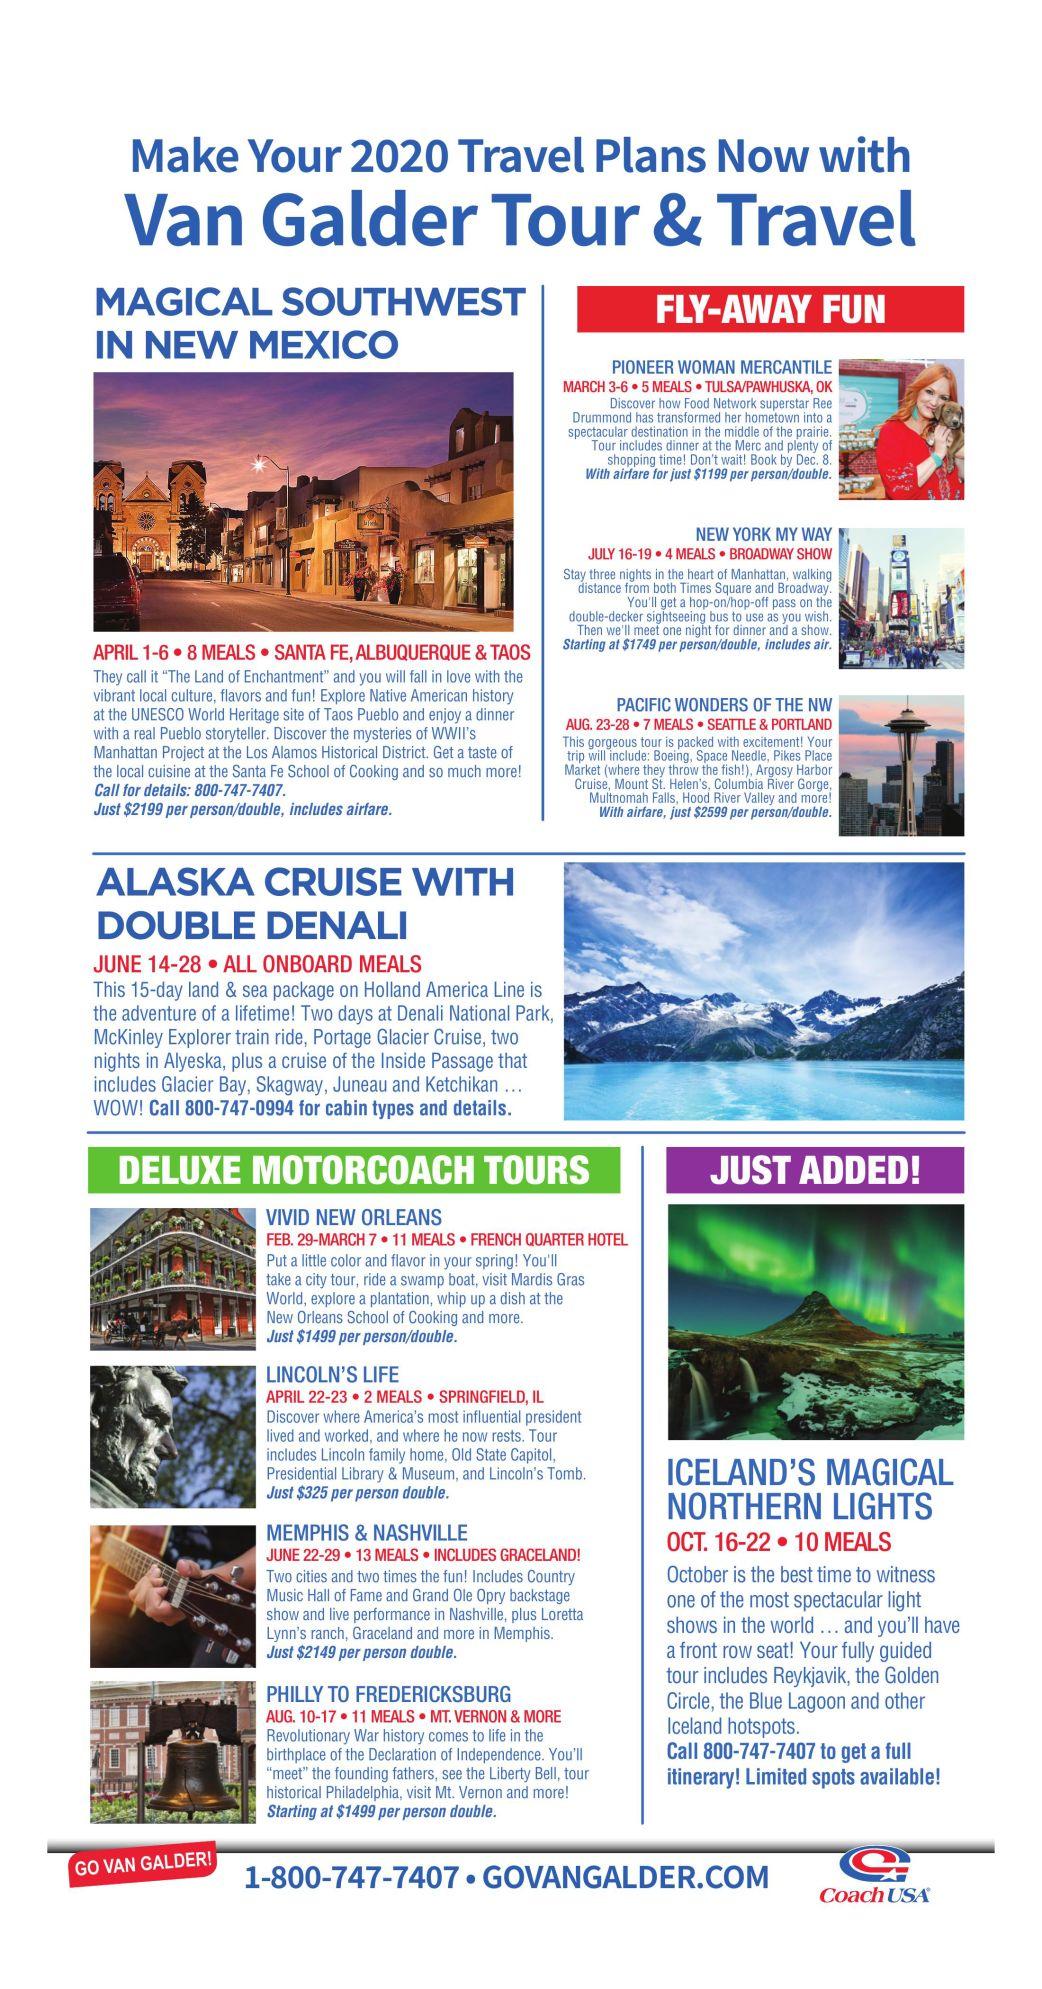 2020 Van Galder Tour & Travel